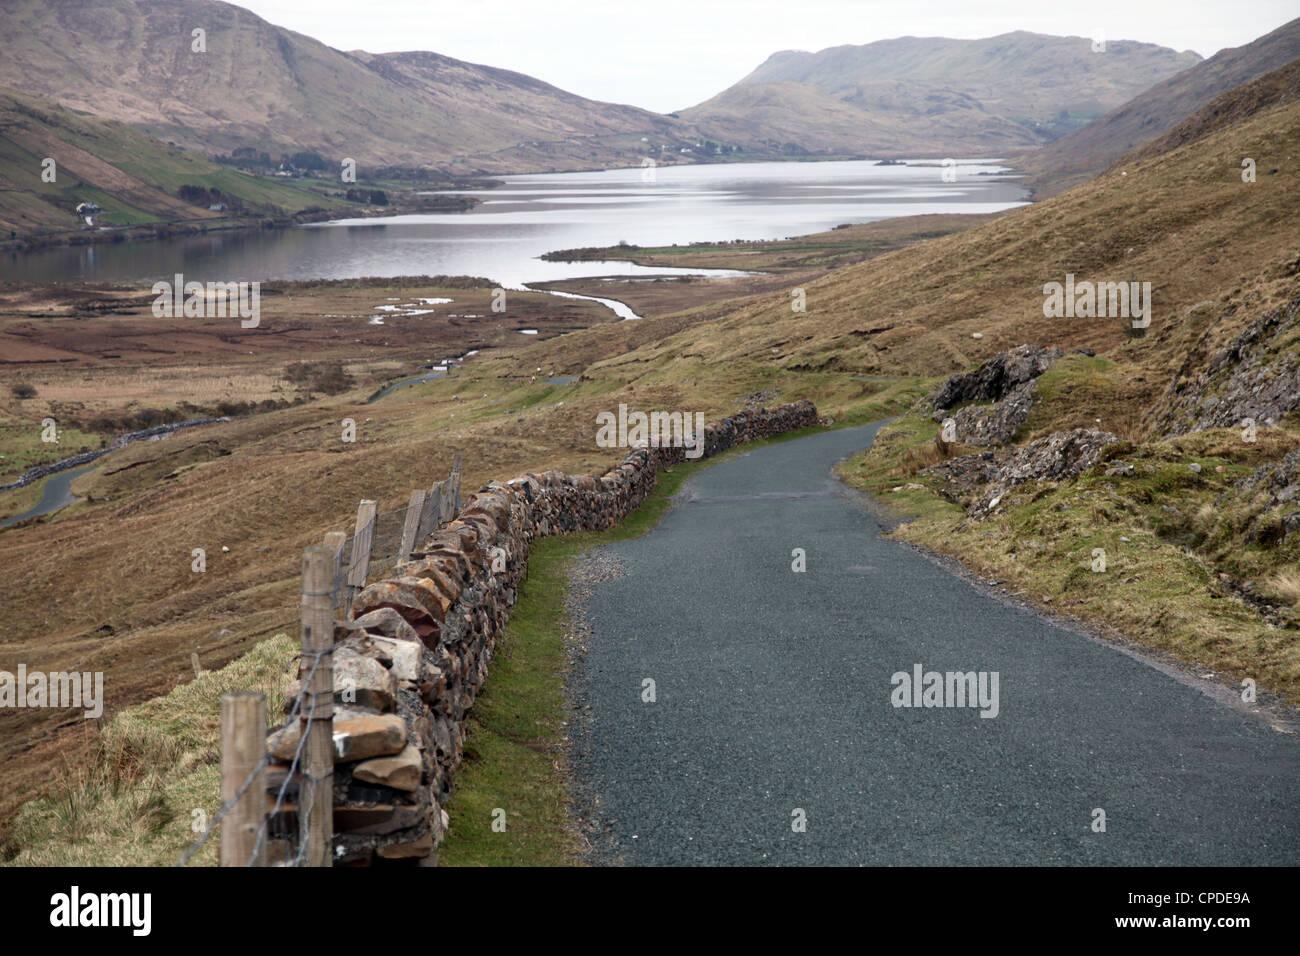 Central Connemara, County Galway, Connacht, Republic of Ireland, Europe - Stock Image